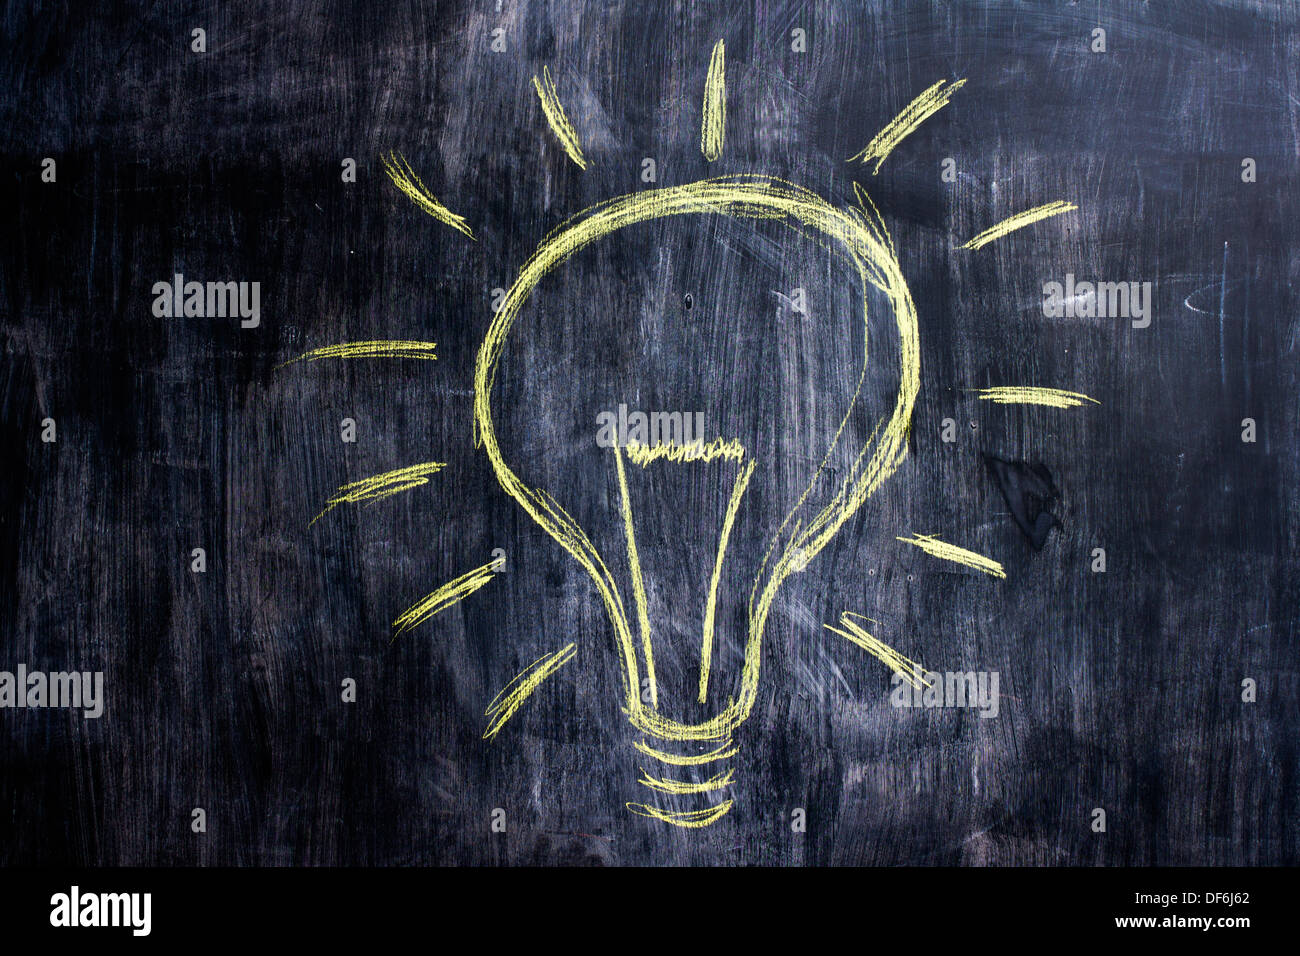 Chalk drawing of light bulb on blackboard - Stock Image